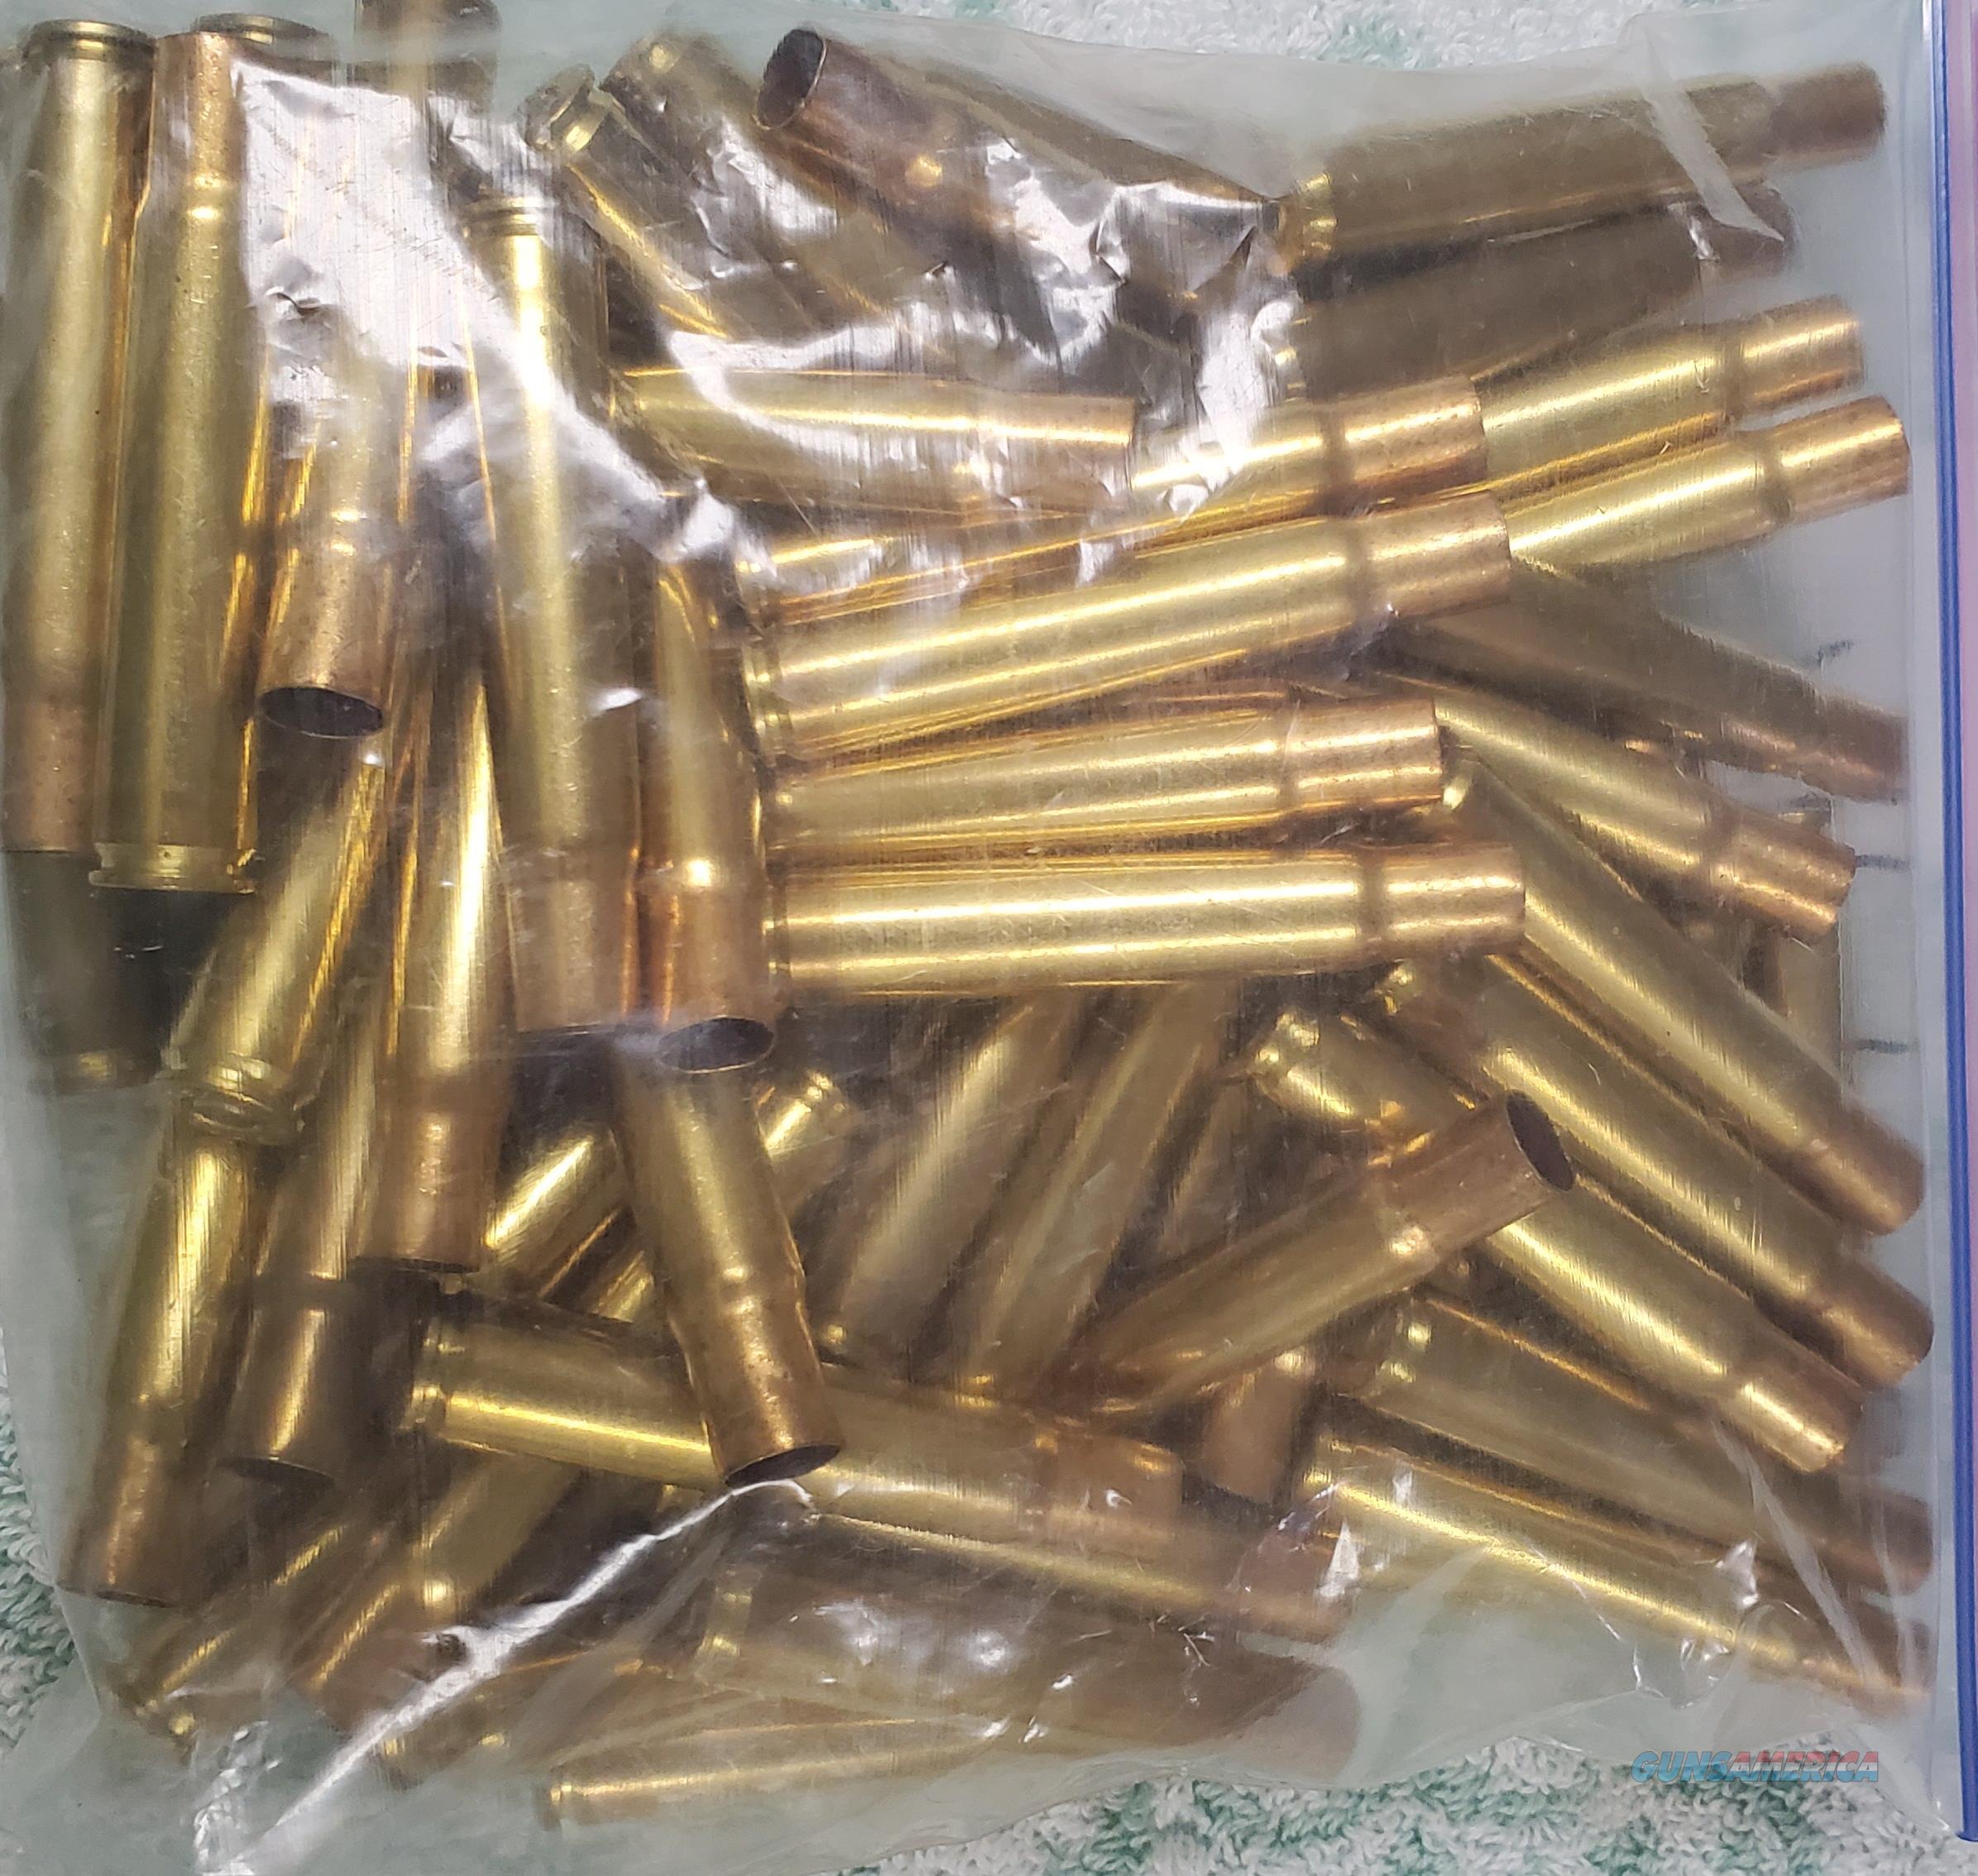 35 Whelen brass for sale new primed  Non-Guns > Reloading > Components > Brass